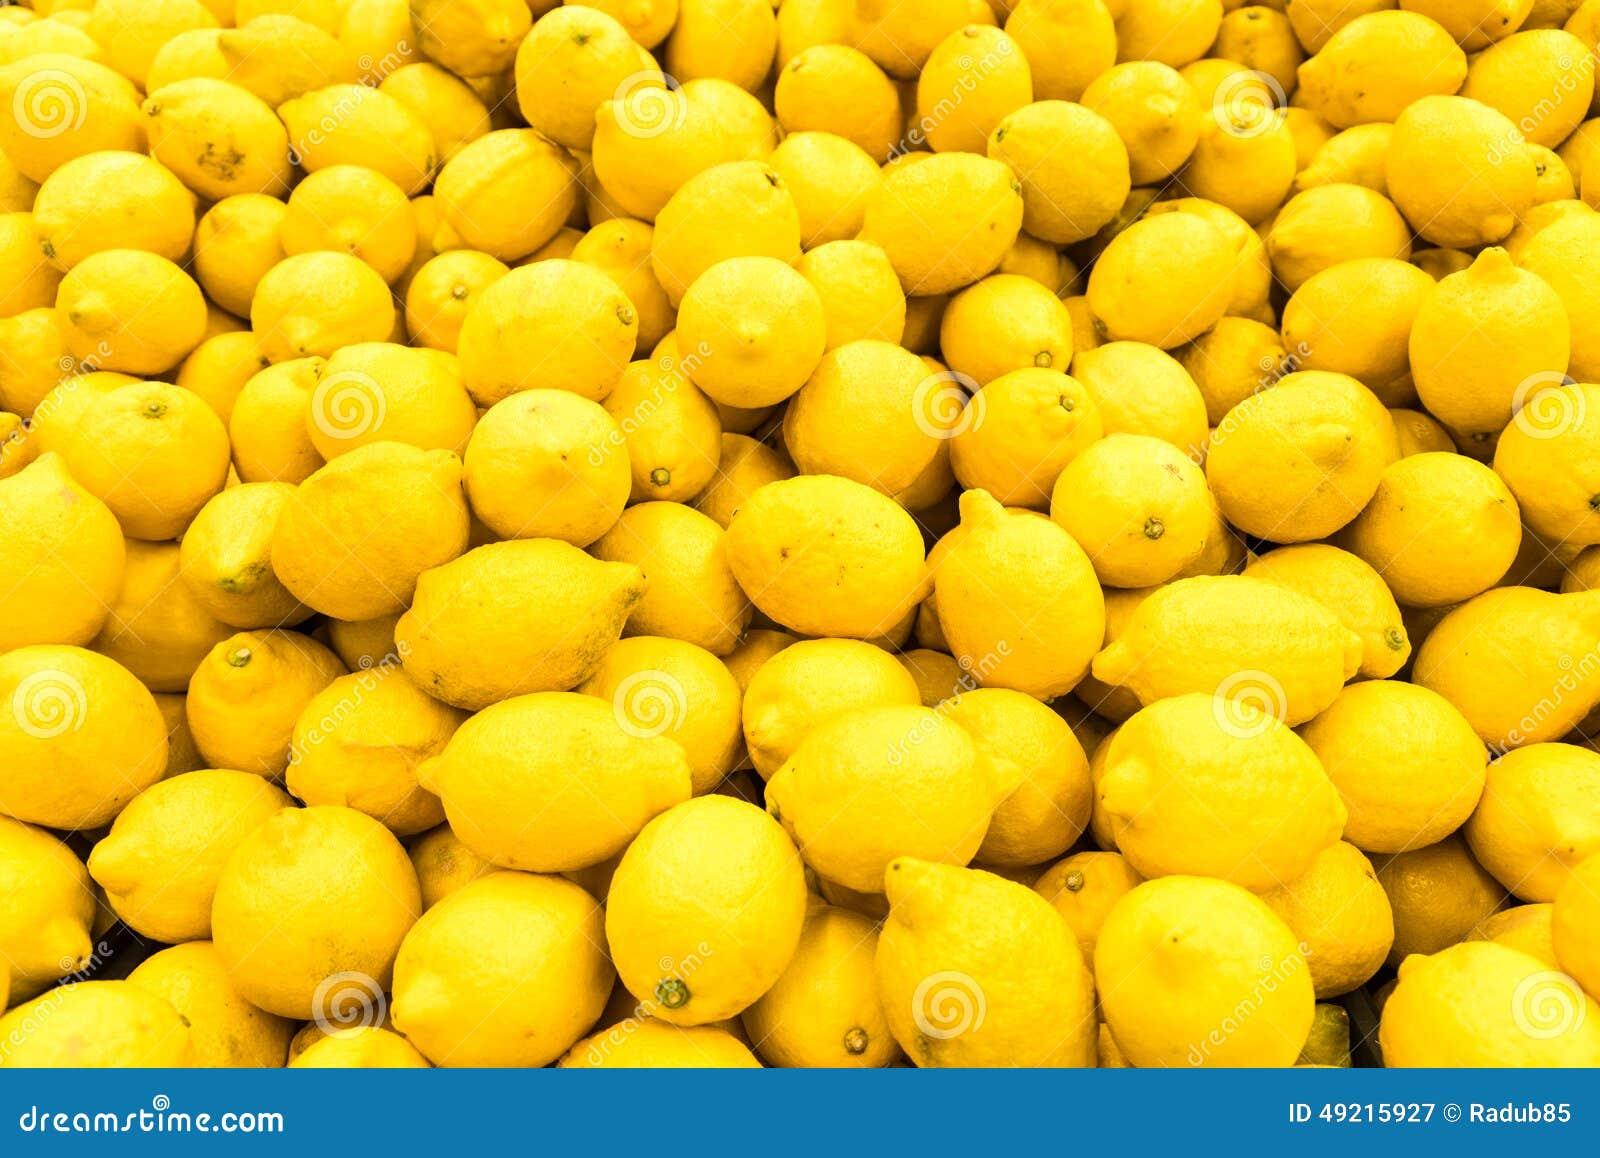 Lemon Pile In Fruit Market Stock Photo - Image: 49215927